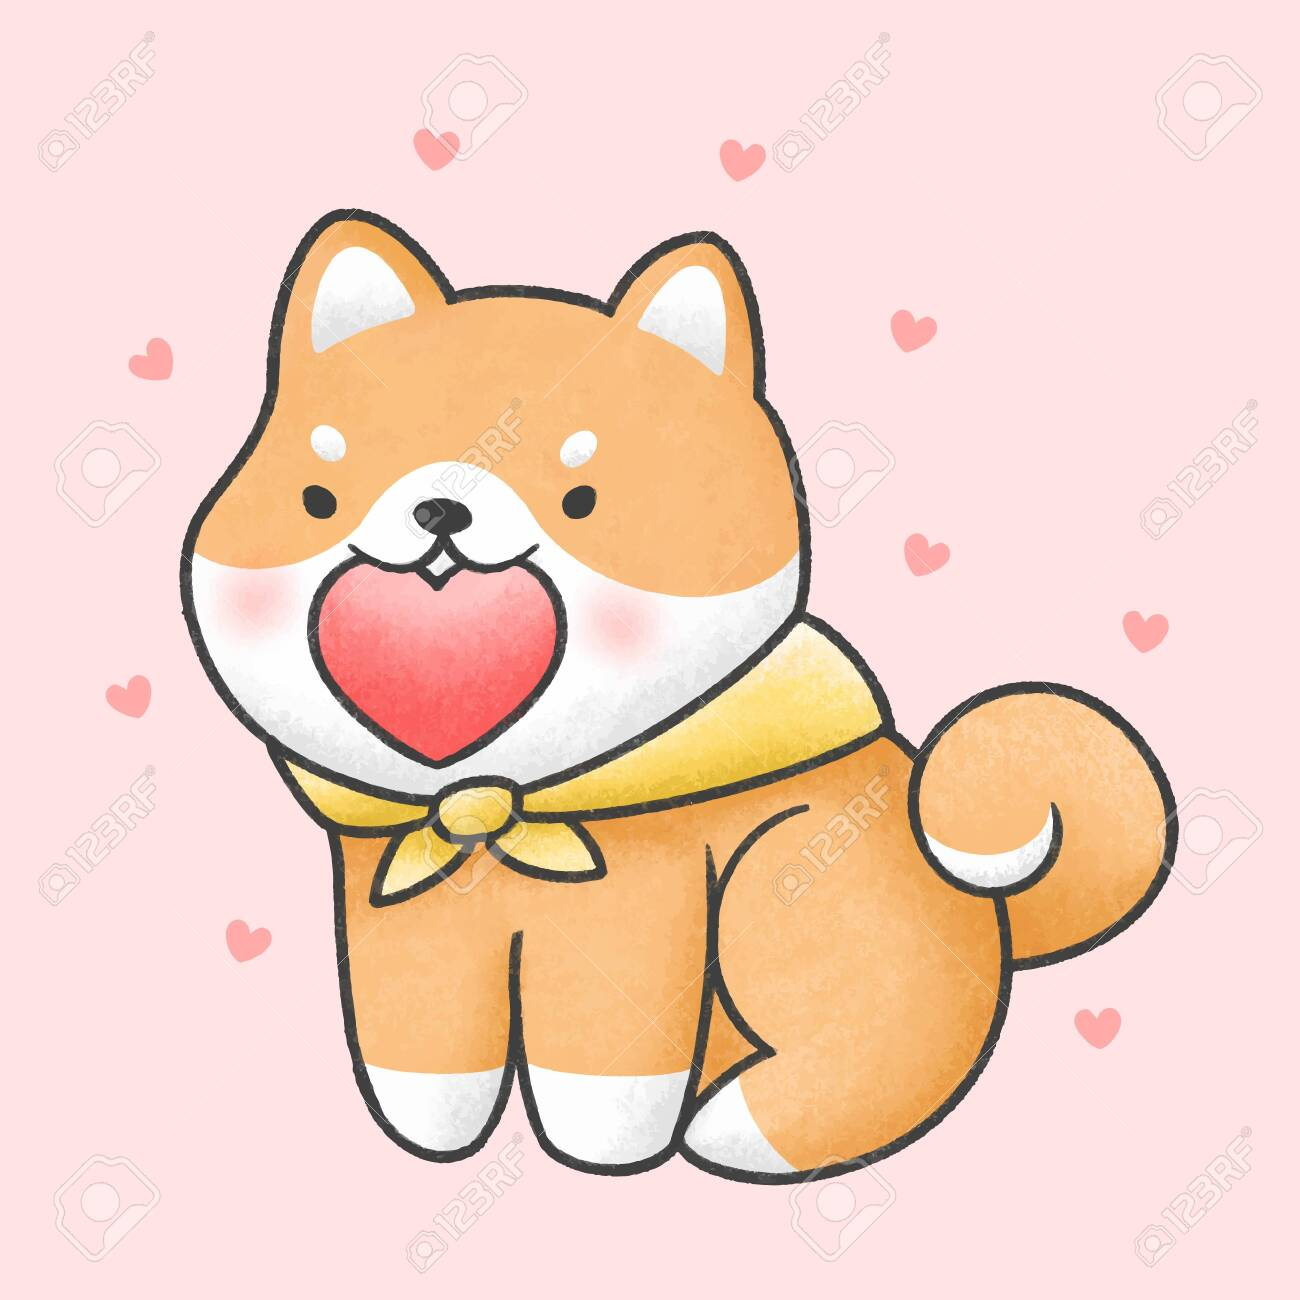 Cute Shiba Inu Dog Holding Heart Hand Drawn Cartoon Animal Character Royalty Free Cliparts Vectors And Stock Illustration Image 137741282